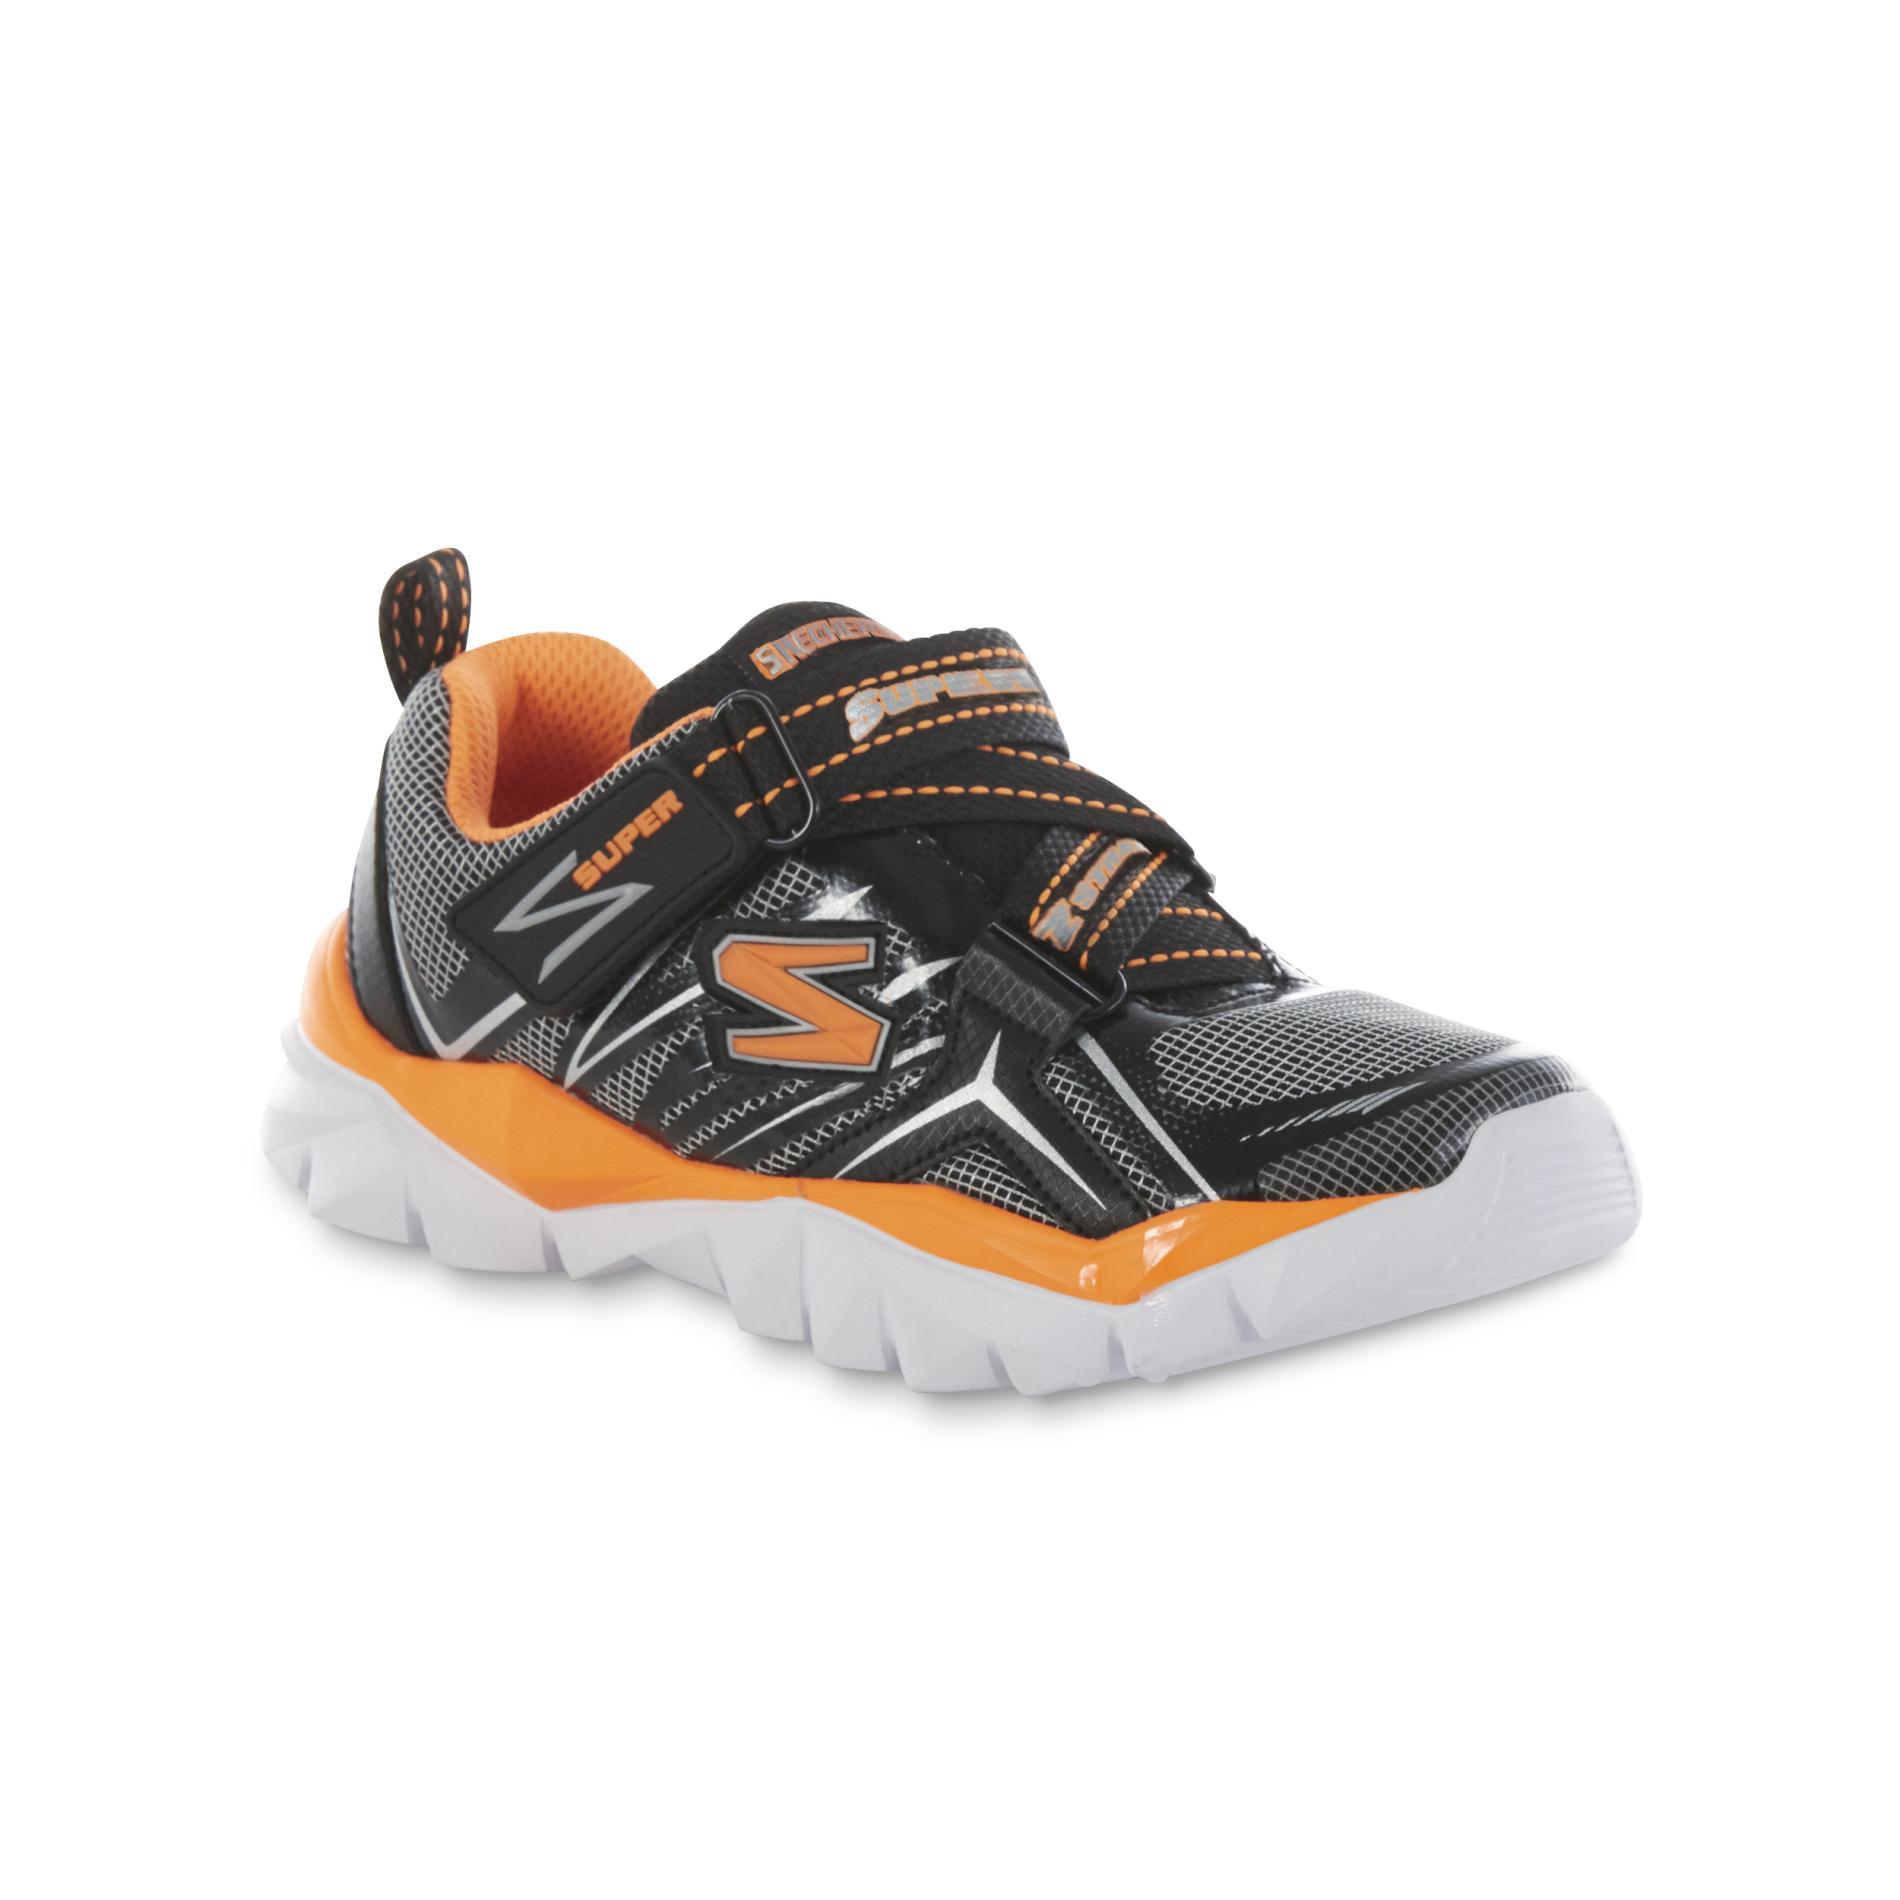 Skechers Boy s Electronz Black White Orange Athletic Shoe